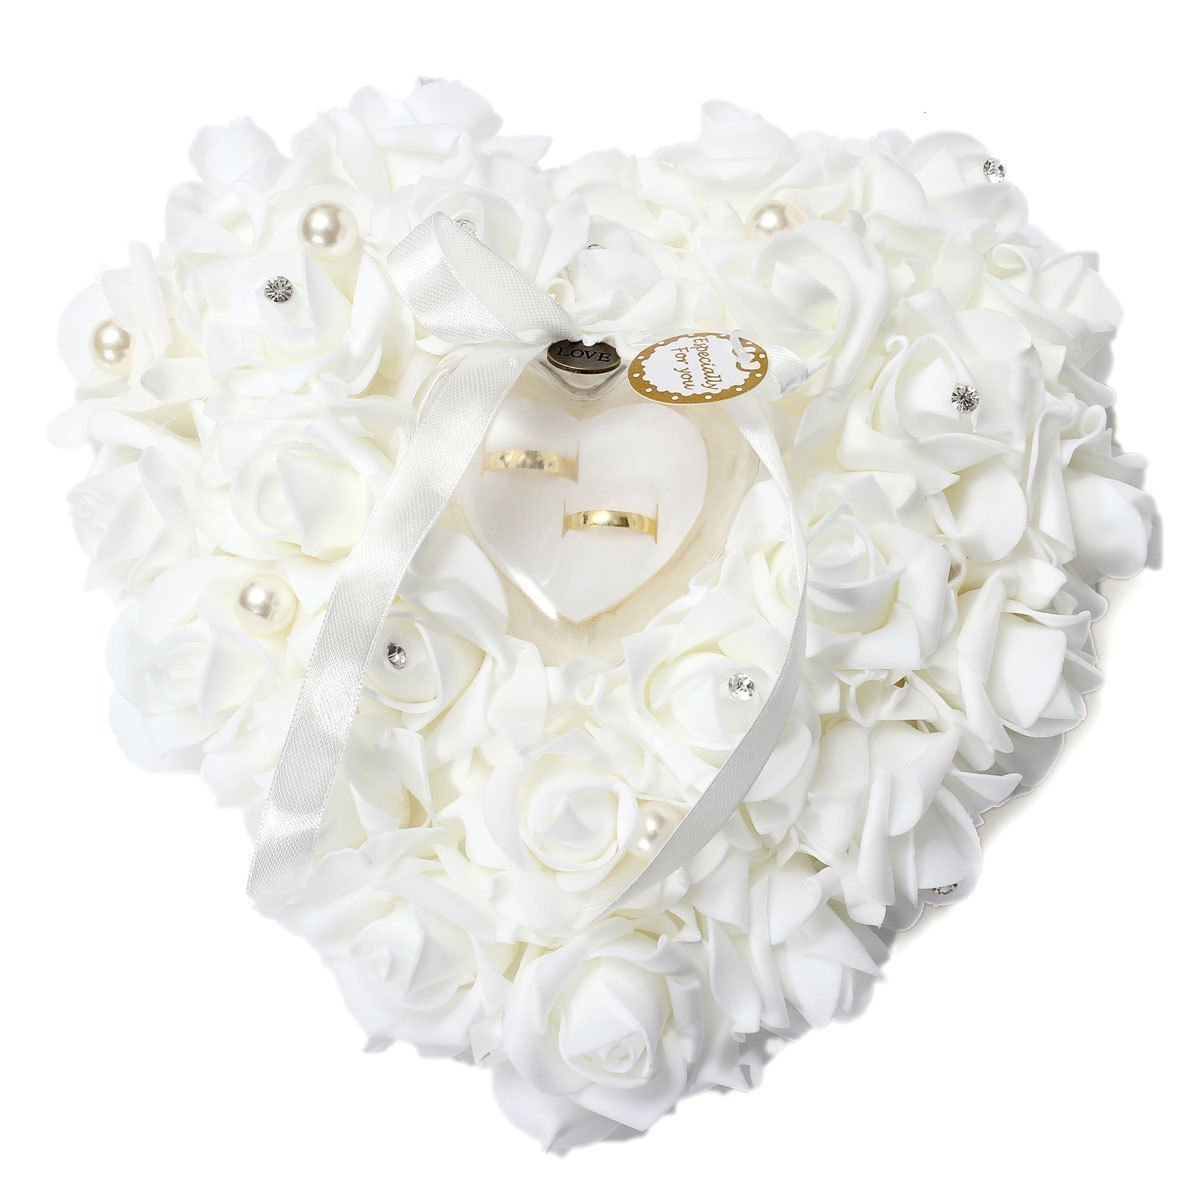 Zerone Wedding Ring Box, Romantic Rose Heart Favors Wedding Ring Pillow Rose Wedding Heart Ring Box Ring Holder by Zerone